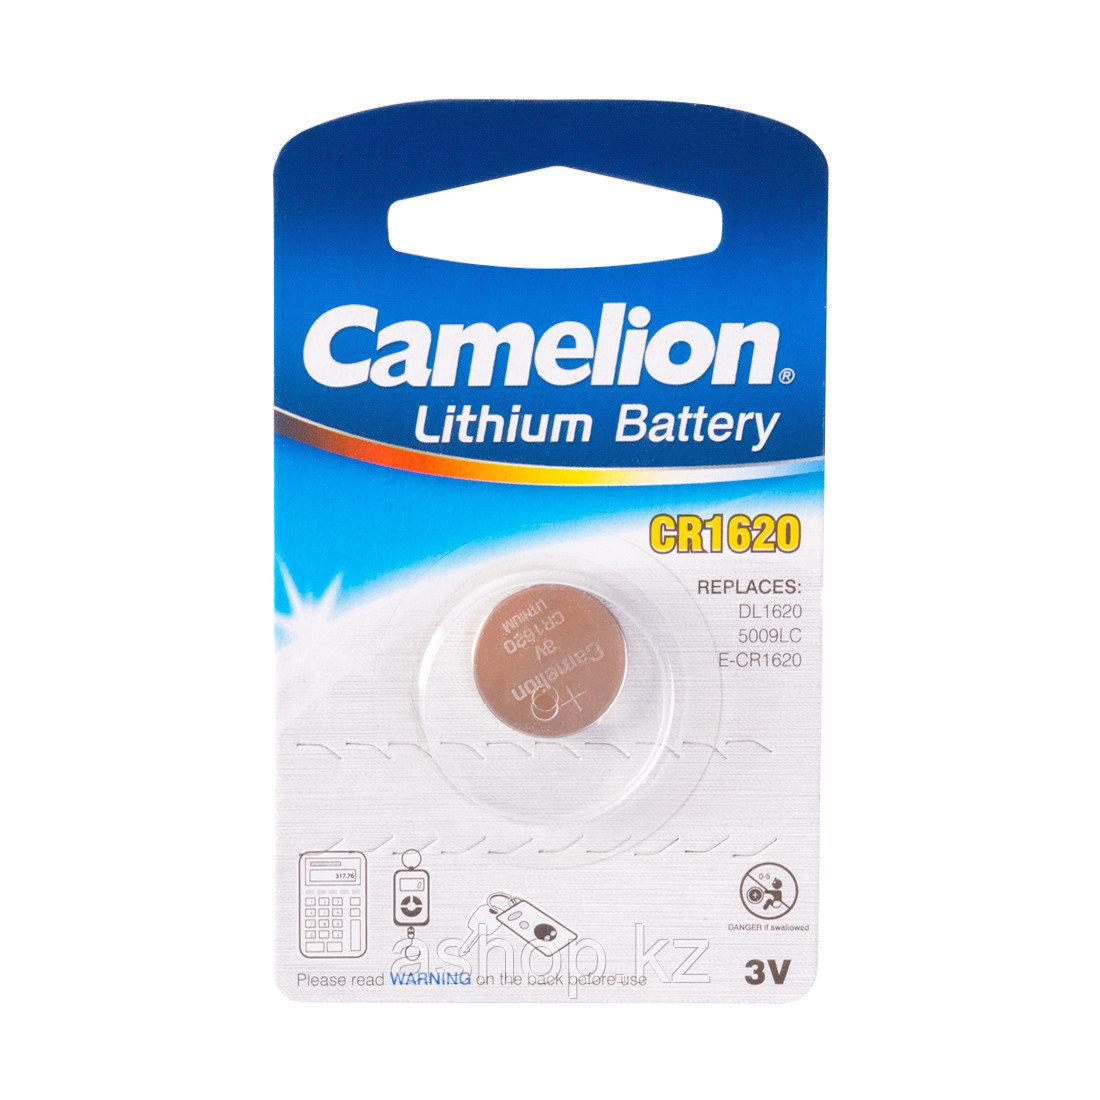 Батарейка Camelion CR1620-BP1 3 В, Упакова: Блистер 1 шт., Аналоги: CR1620\5009LC, Тип батареи: Литий-ионный